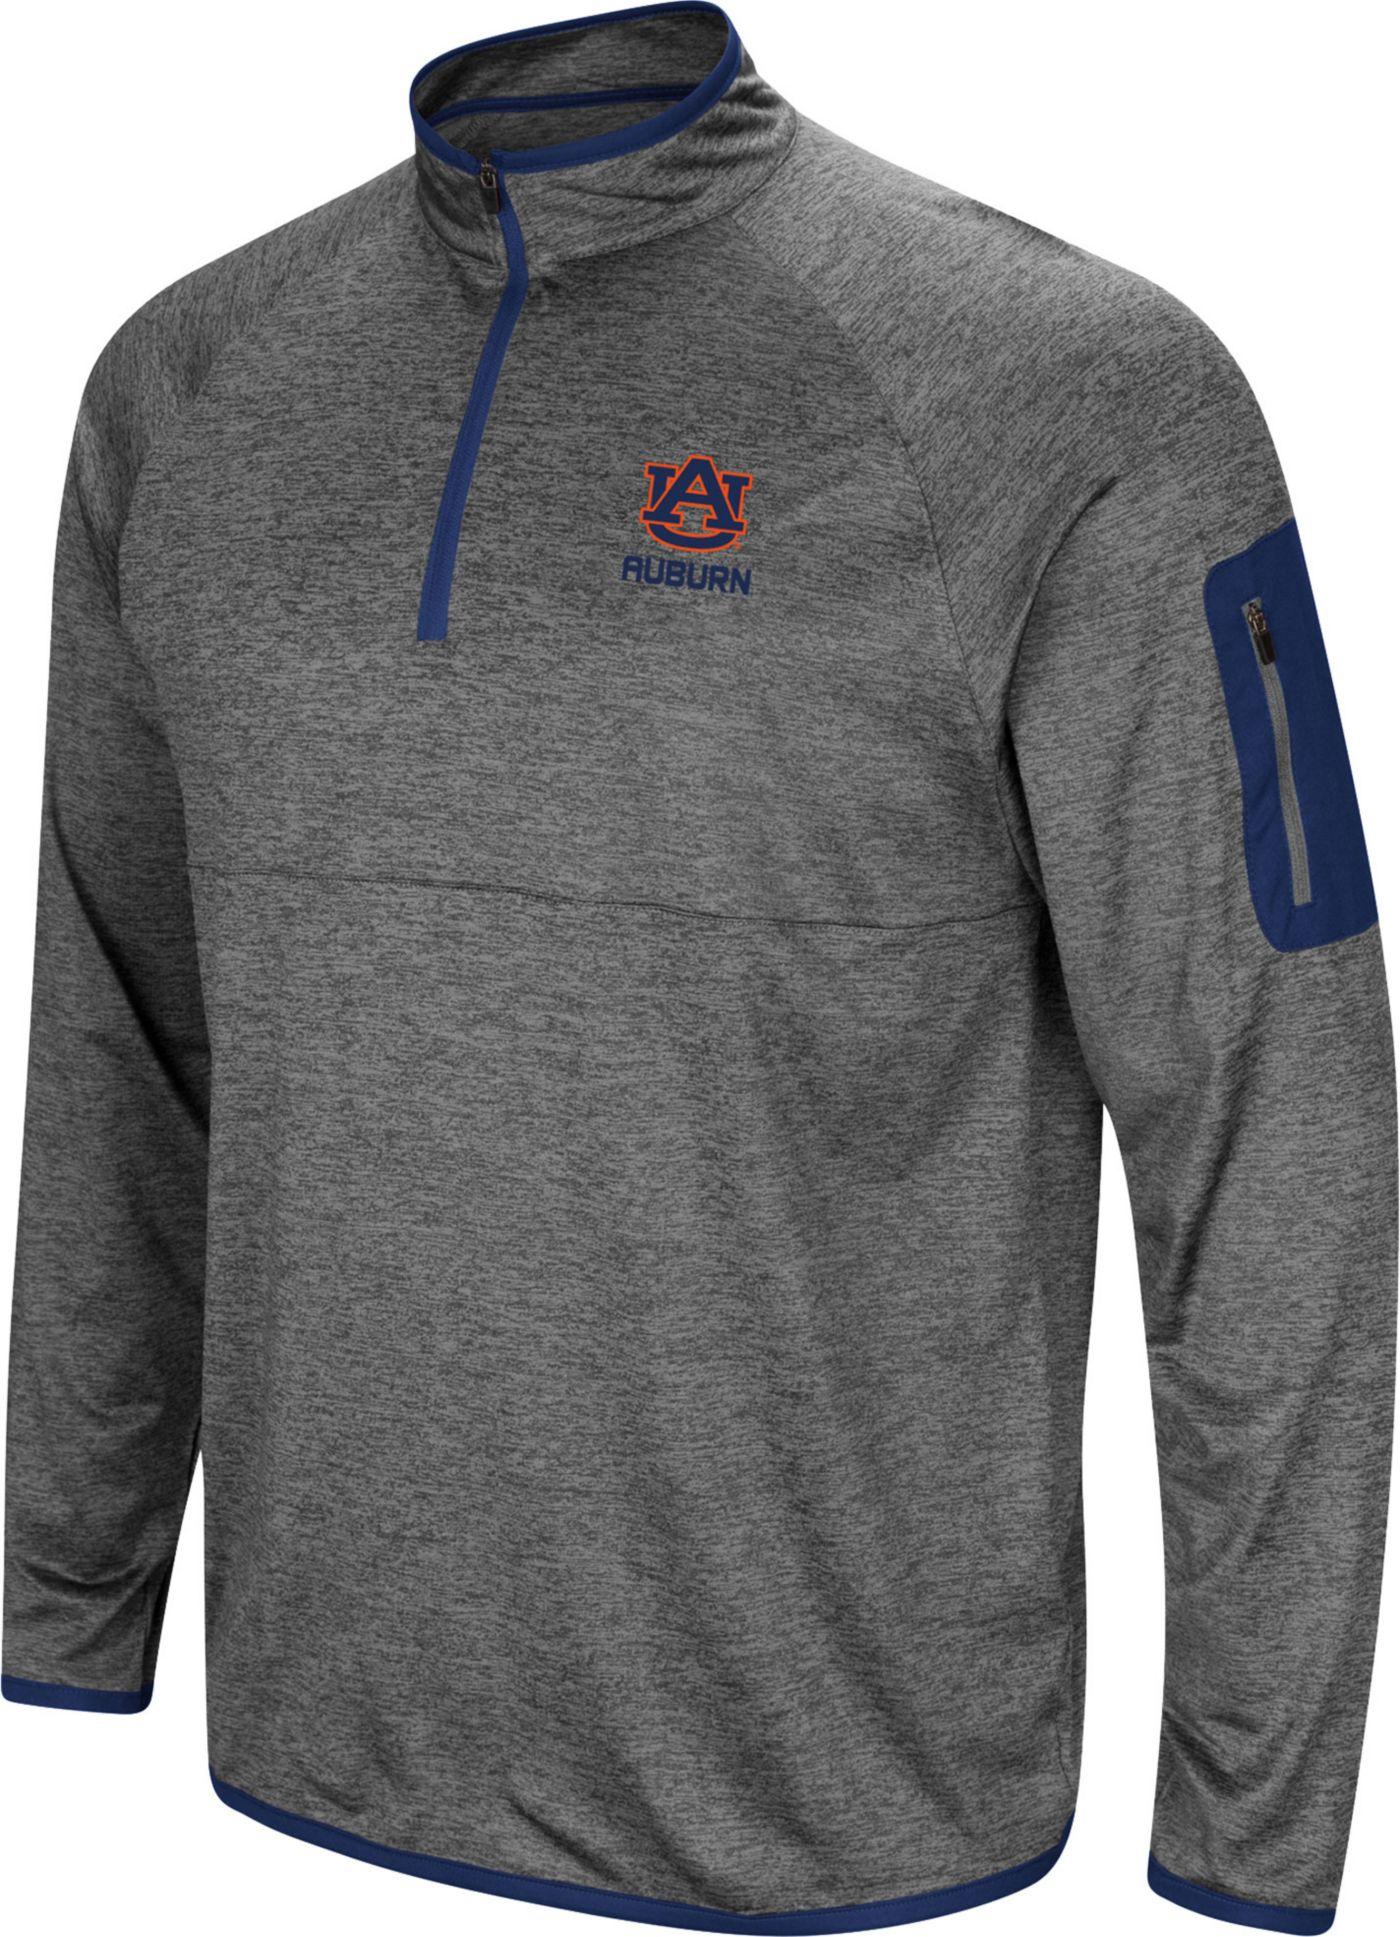 Colosseum Men's Auburn Tigers Grey Indus River Quarter-Zip Shirt